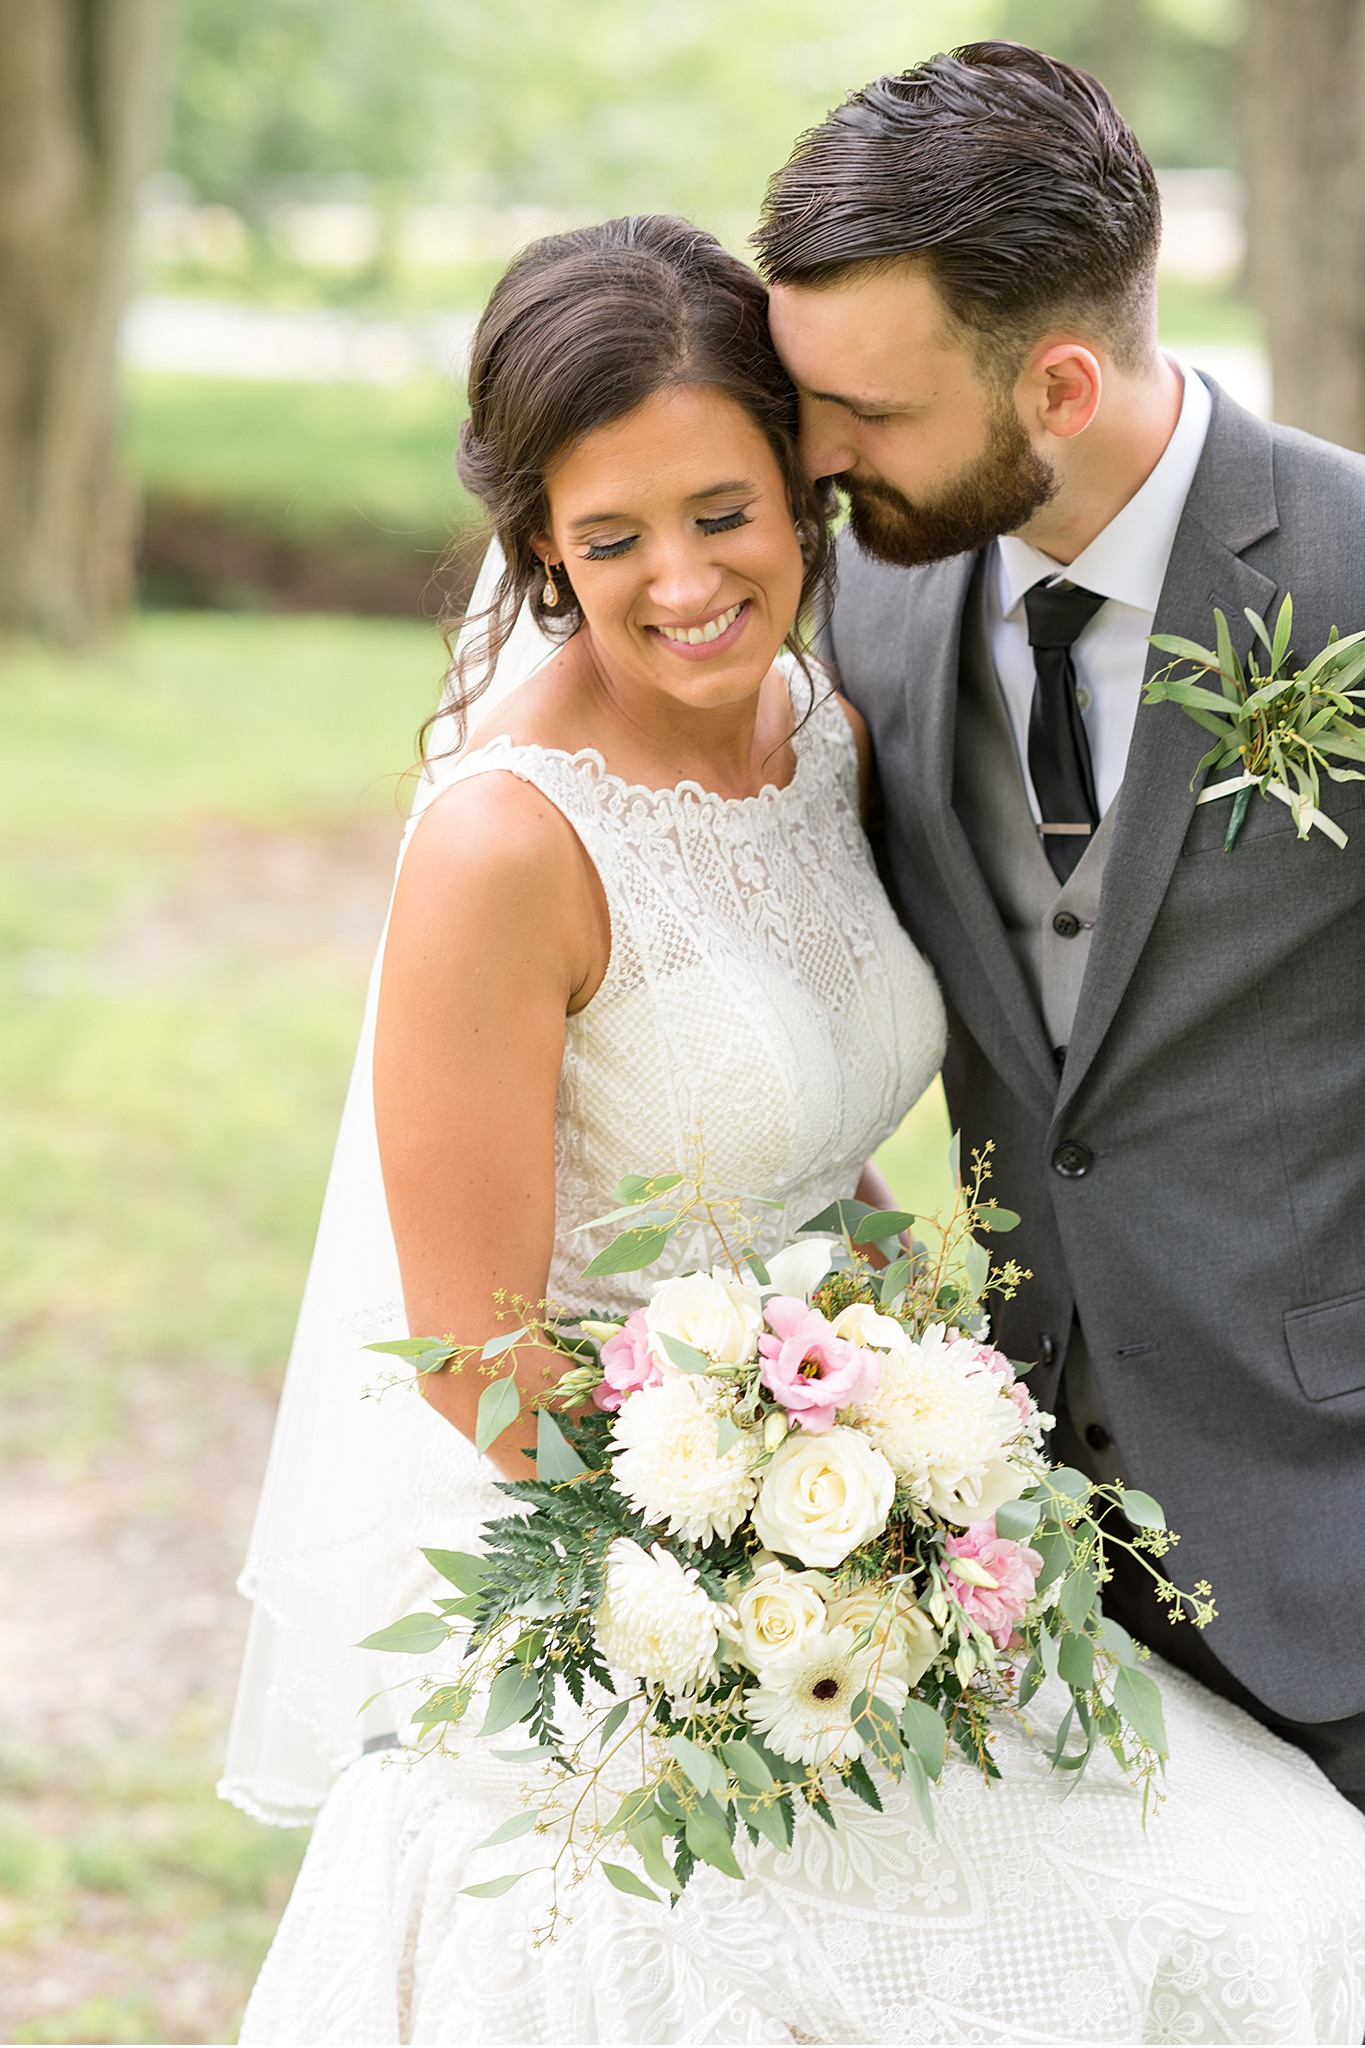 Simmontown wedding Barn Lancaster PA wedding engagement Photography_3598.jpg